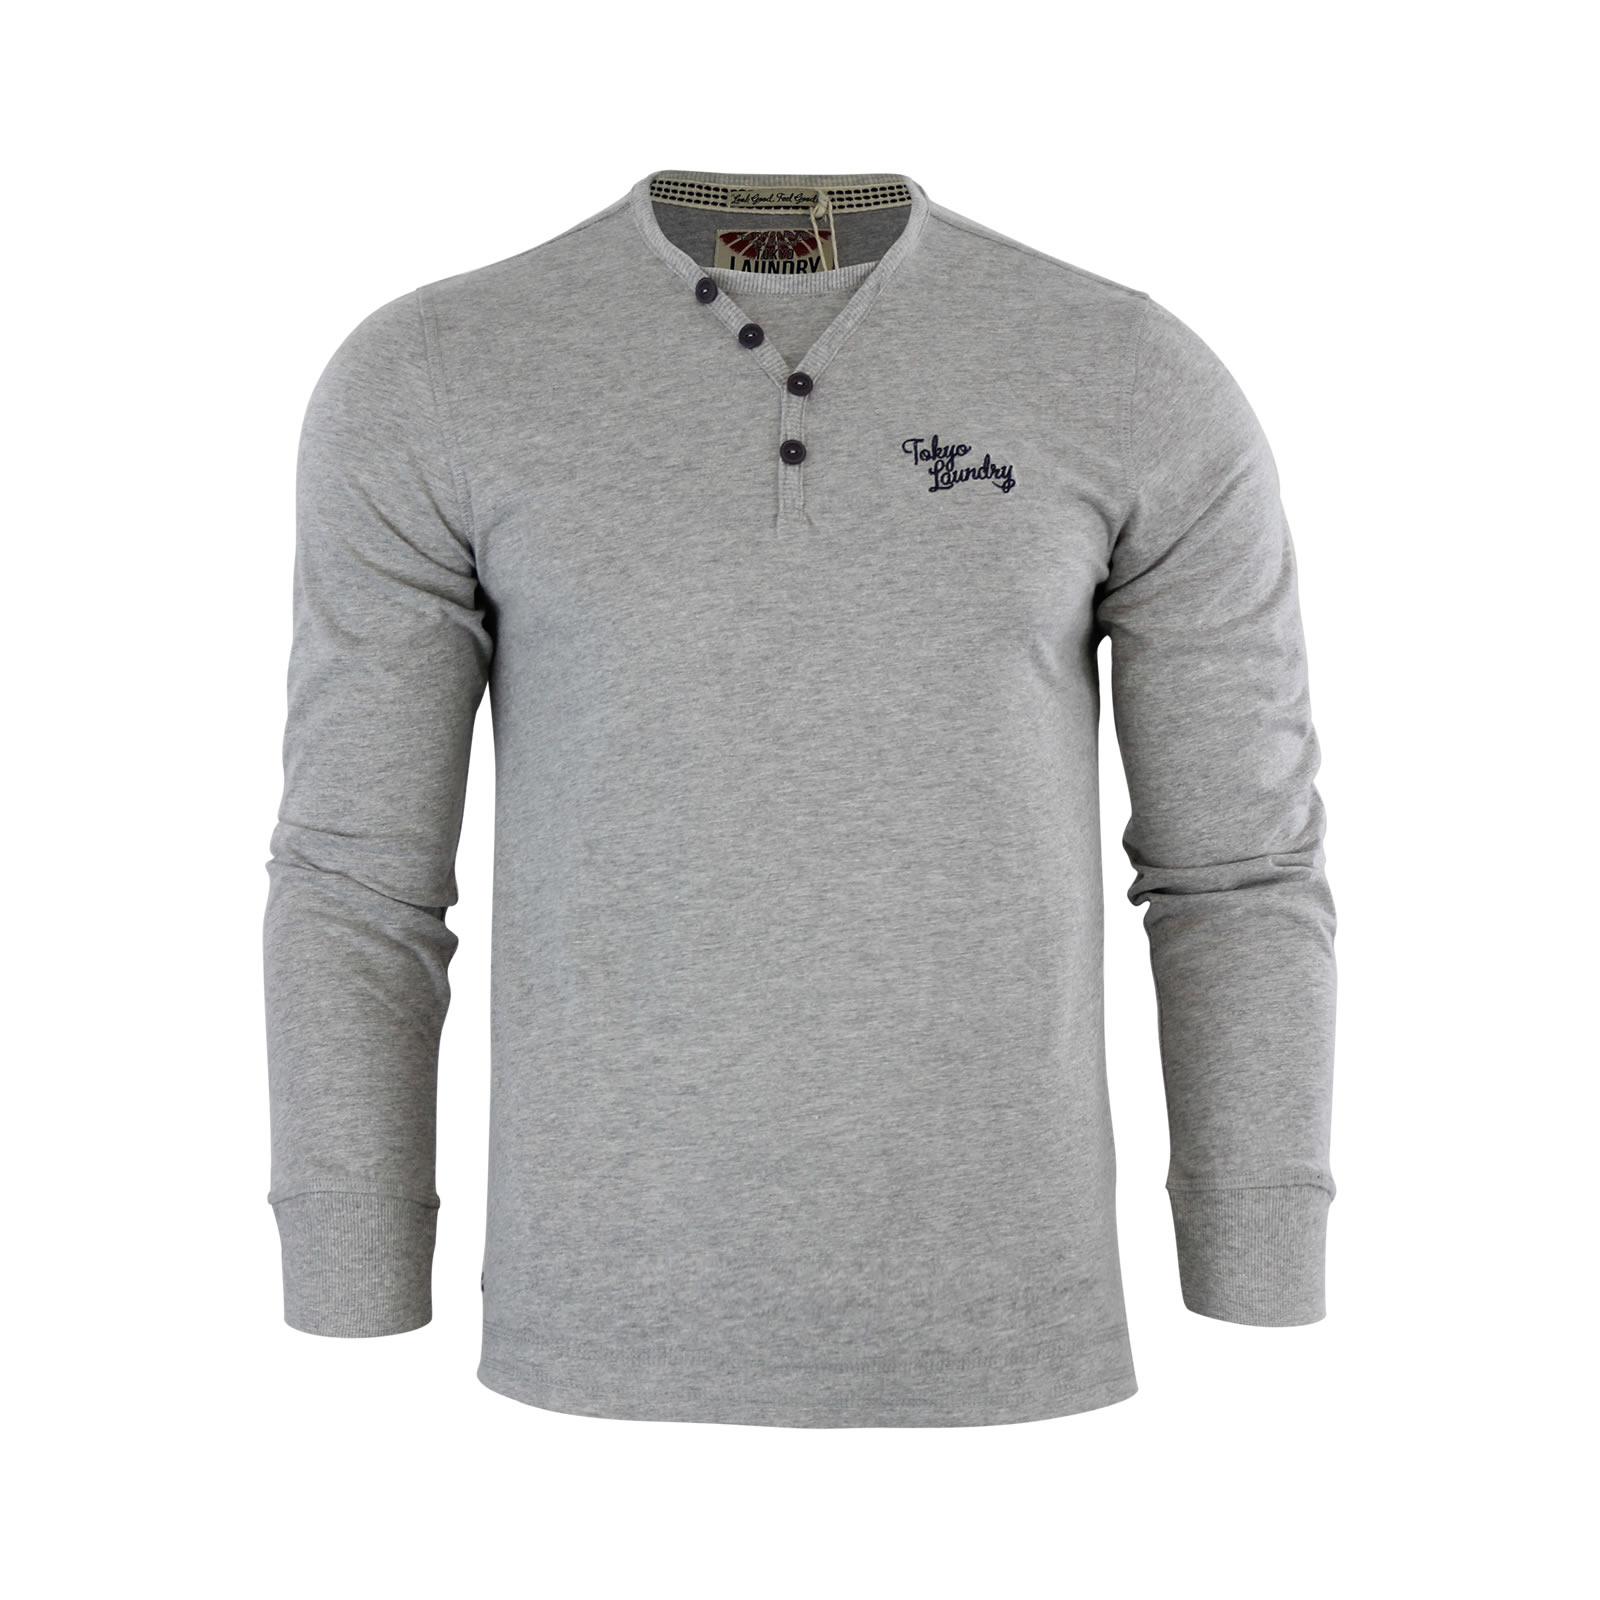 Mens t shirt tokyo laundry glen valley long sleeve cotton for Mock long sleeve t shirts